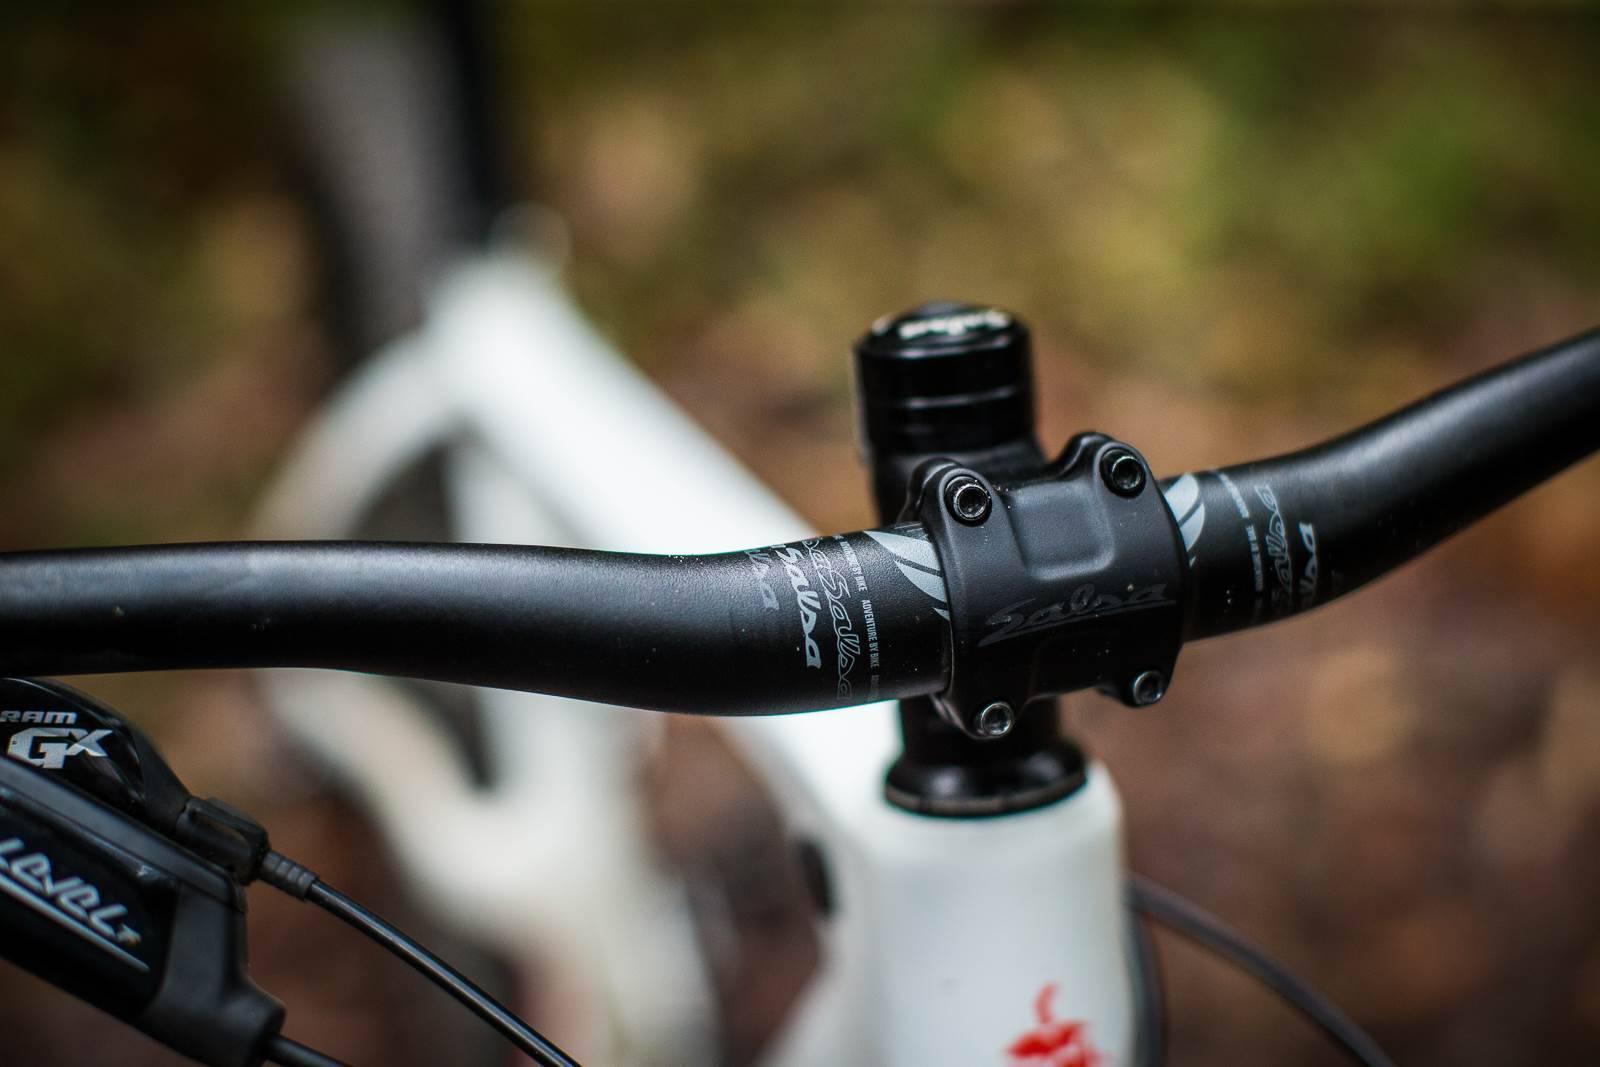 TESTED: Salsa Woodsmoke Carbon 27 5 plus - Australian Mountain Bike